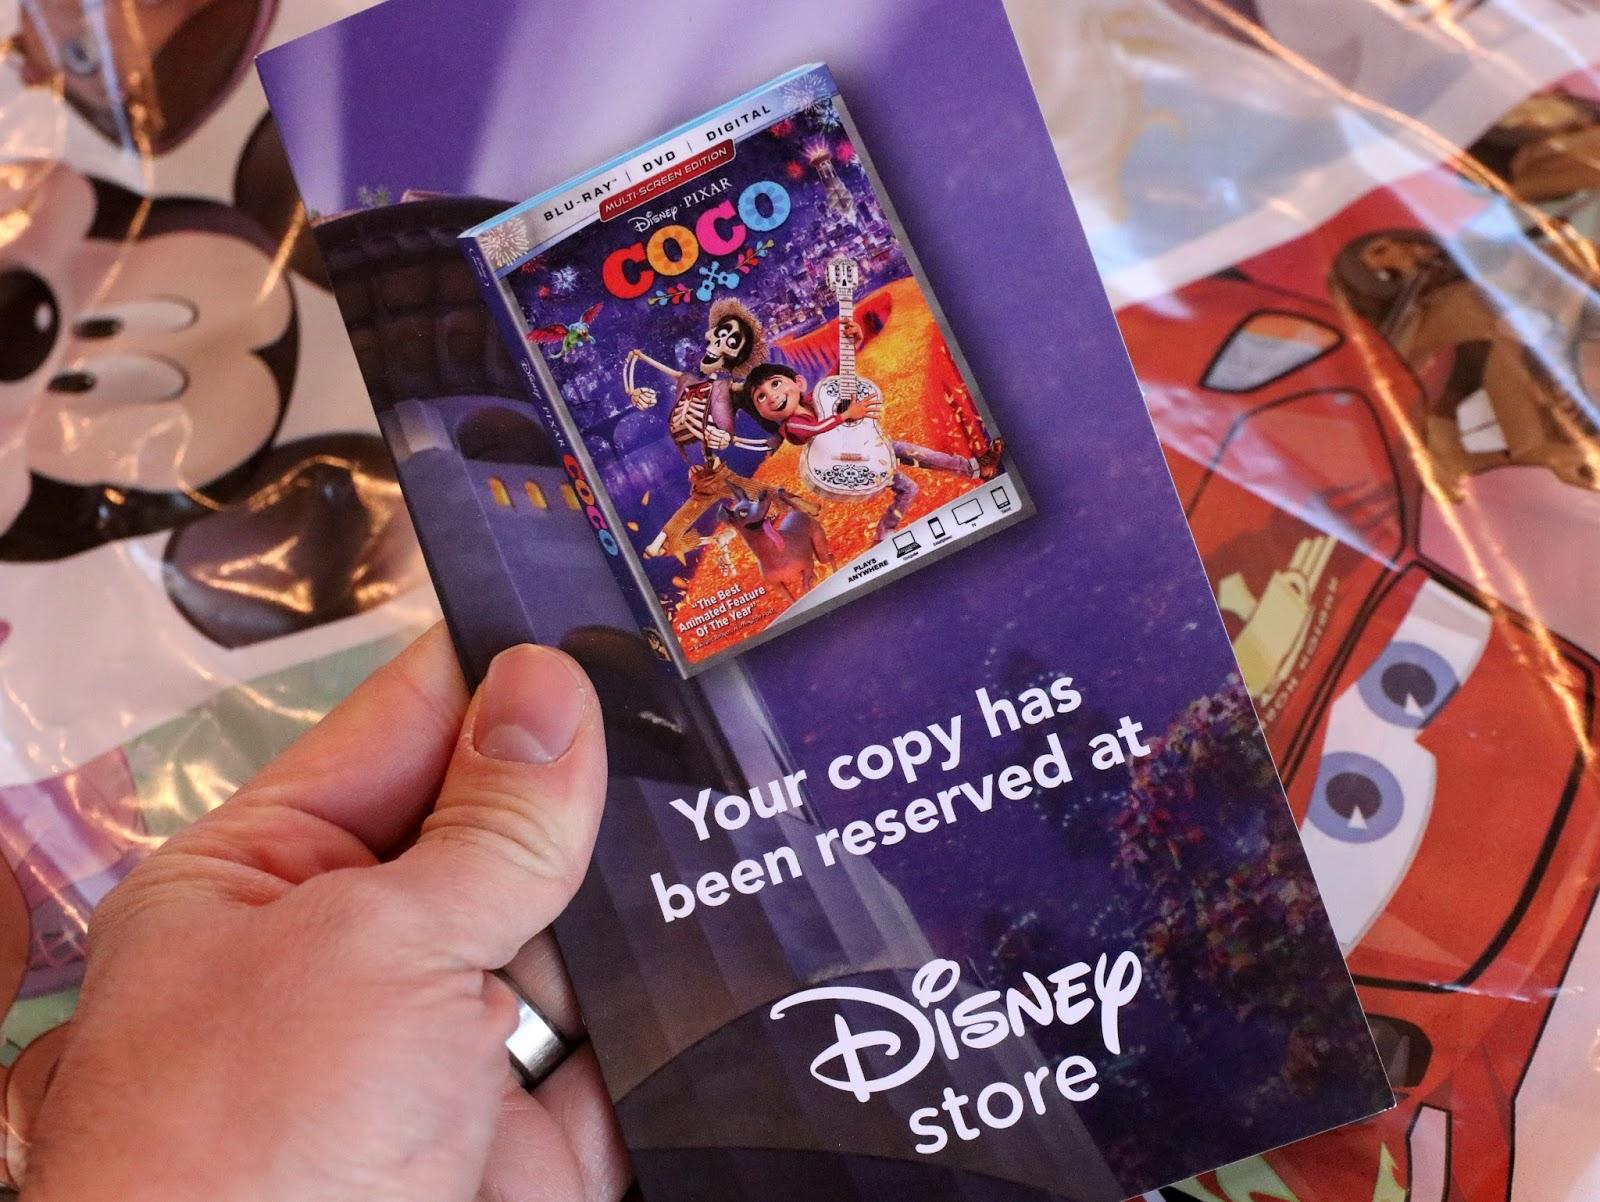 pixar disney store coco lithograph set